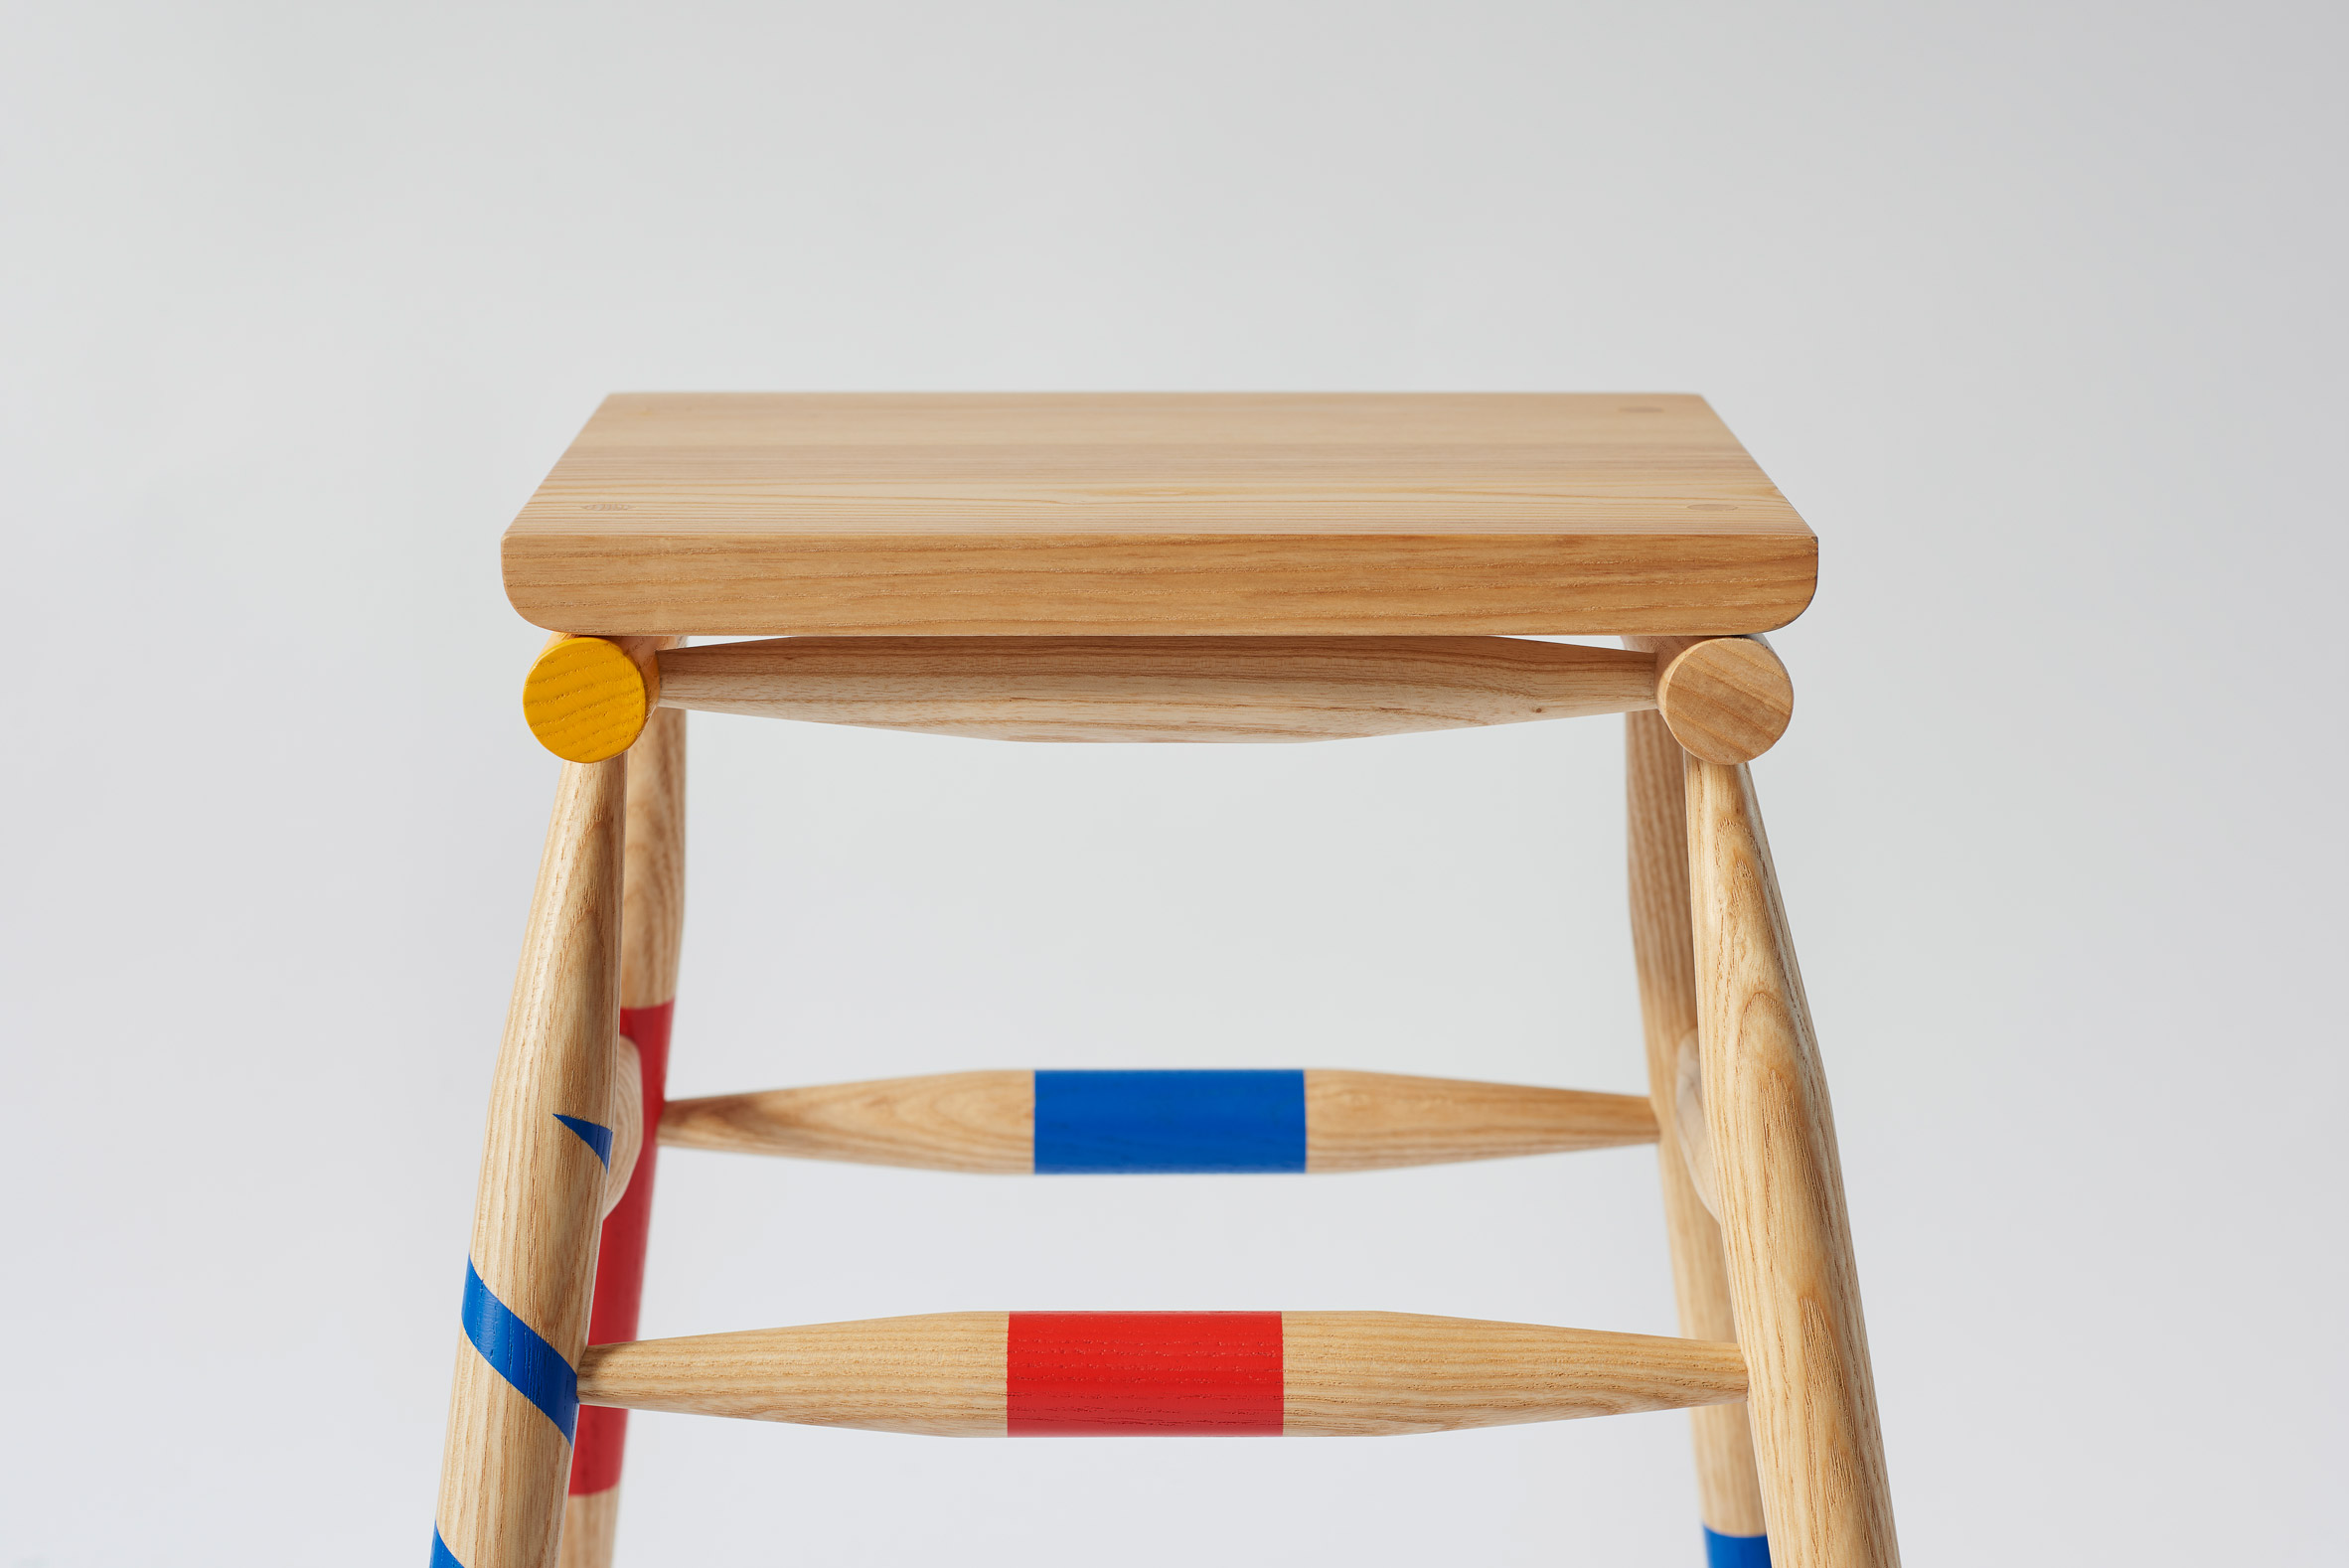 Rio Kobayashi bases colourful furniture on traditional game Mikado